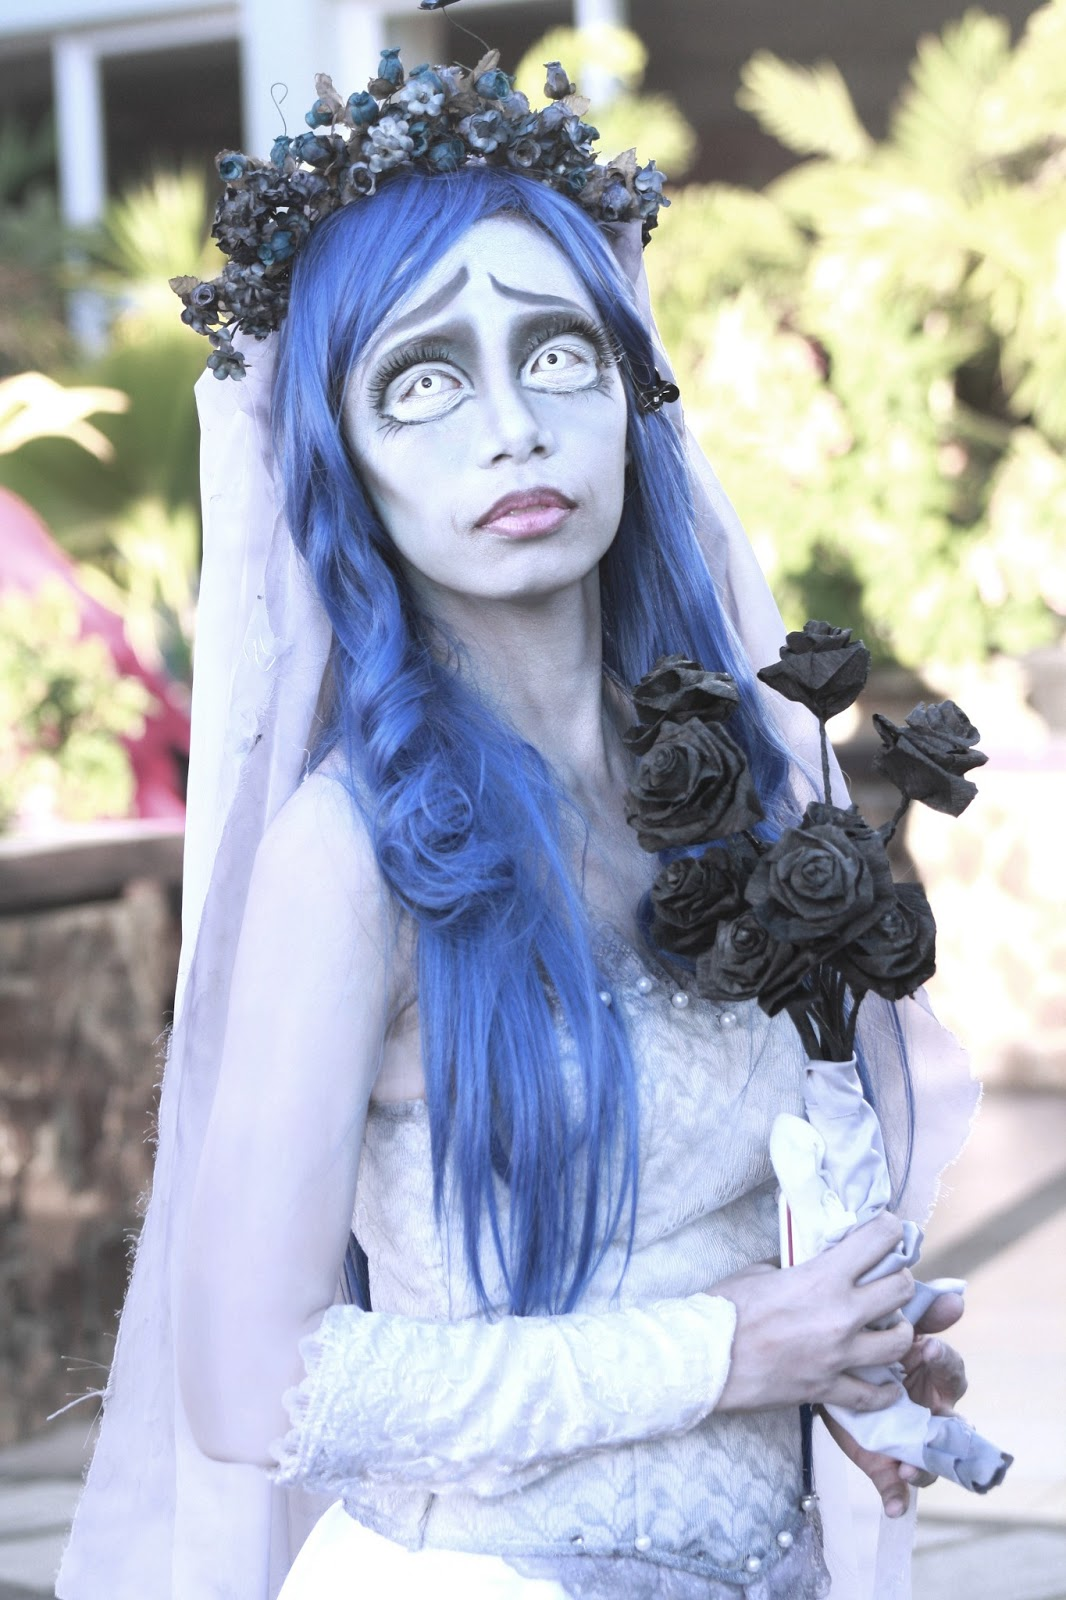 Corpse Bride Halloween Costume Diy.Oishari Diy Corpse Bride Cosplay